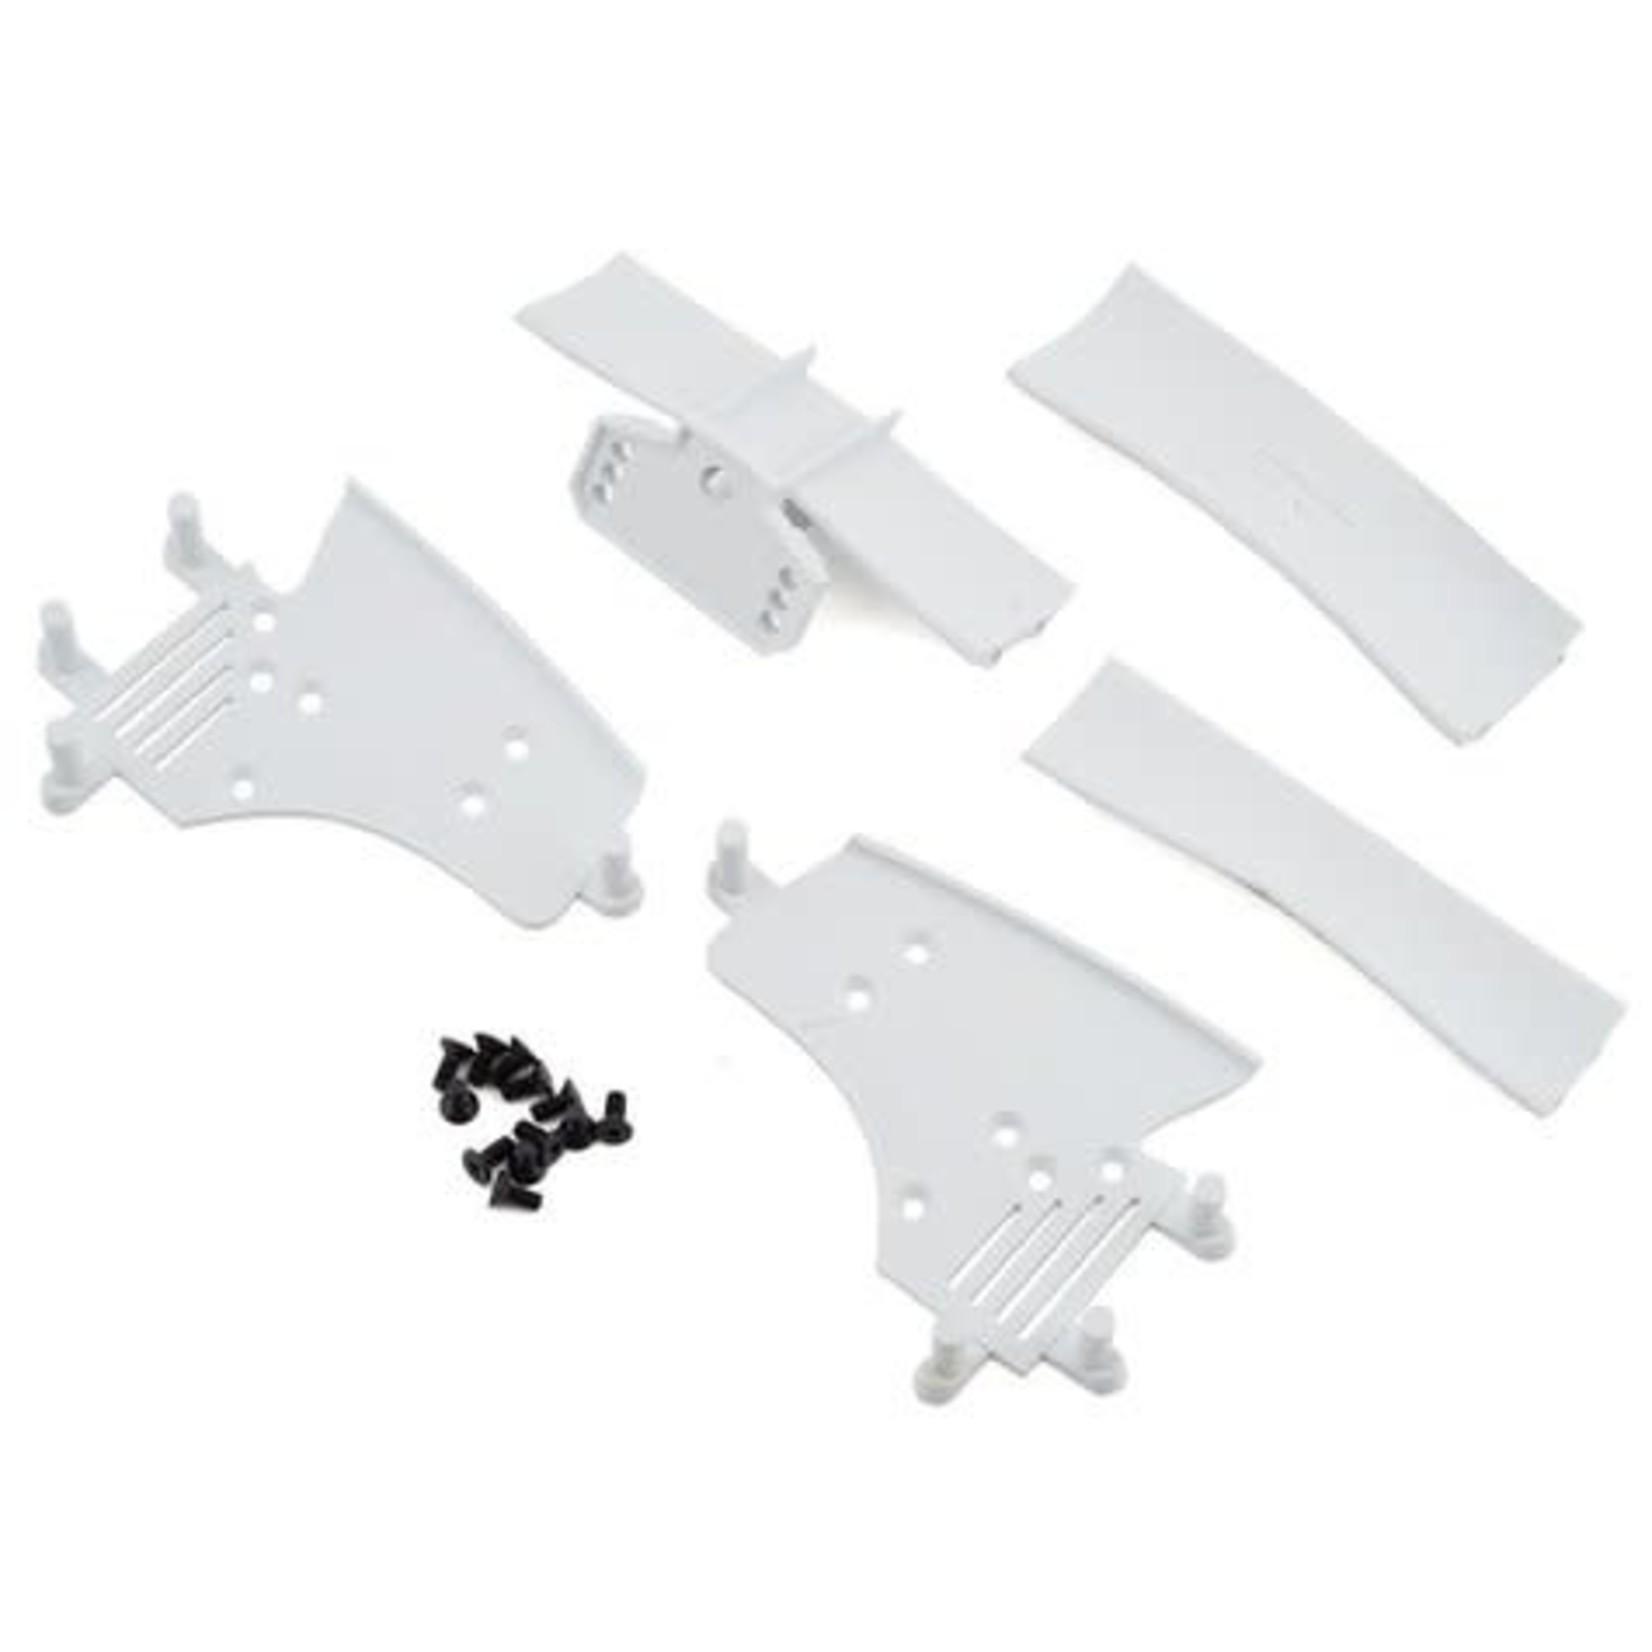 PROTOform 1/10 F1 Rear Wing (White)